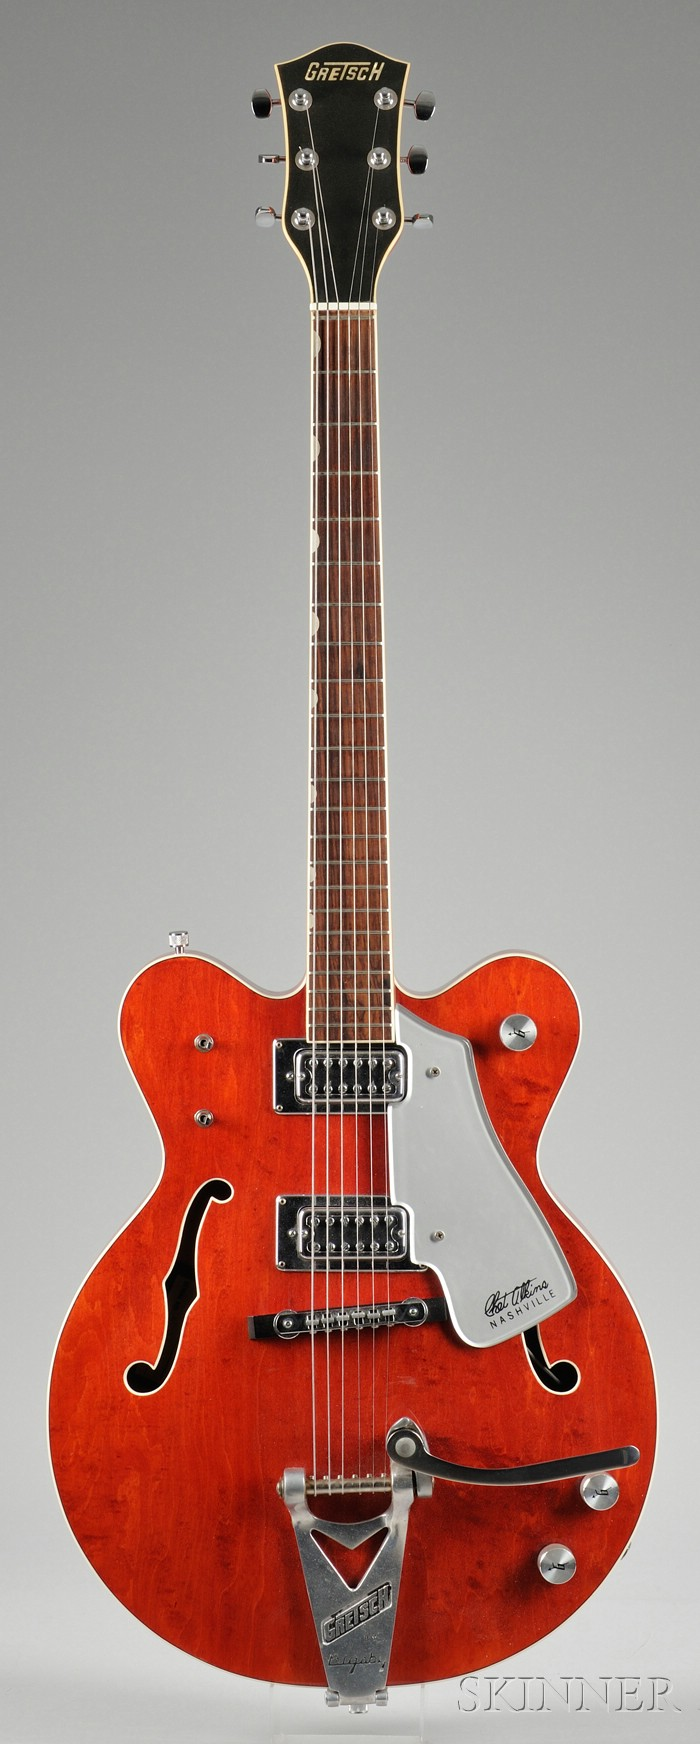 American Electric Guitar, Gretsch Company, c. 1972, Model Chet Atkins Nashville 7660